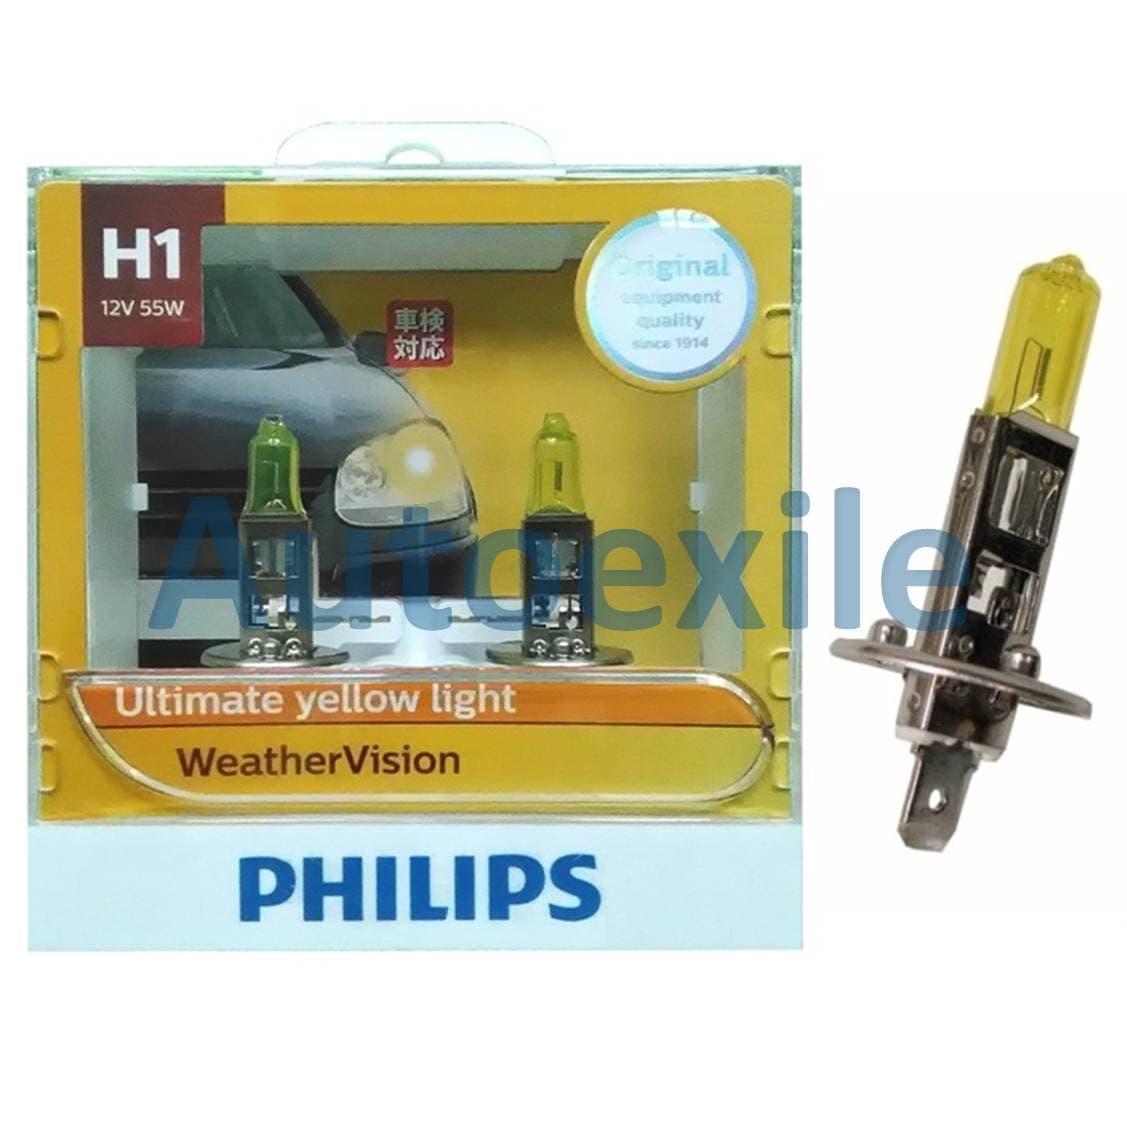 Philips New Weather Vision H1 12V 55W 2900K Lampu Depan Kuning Mobil